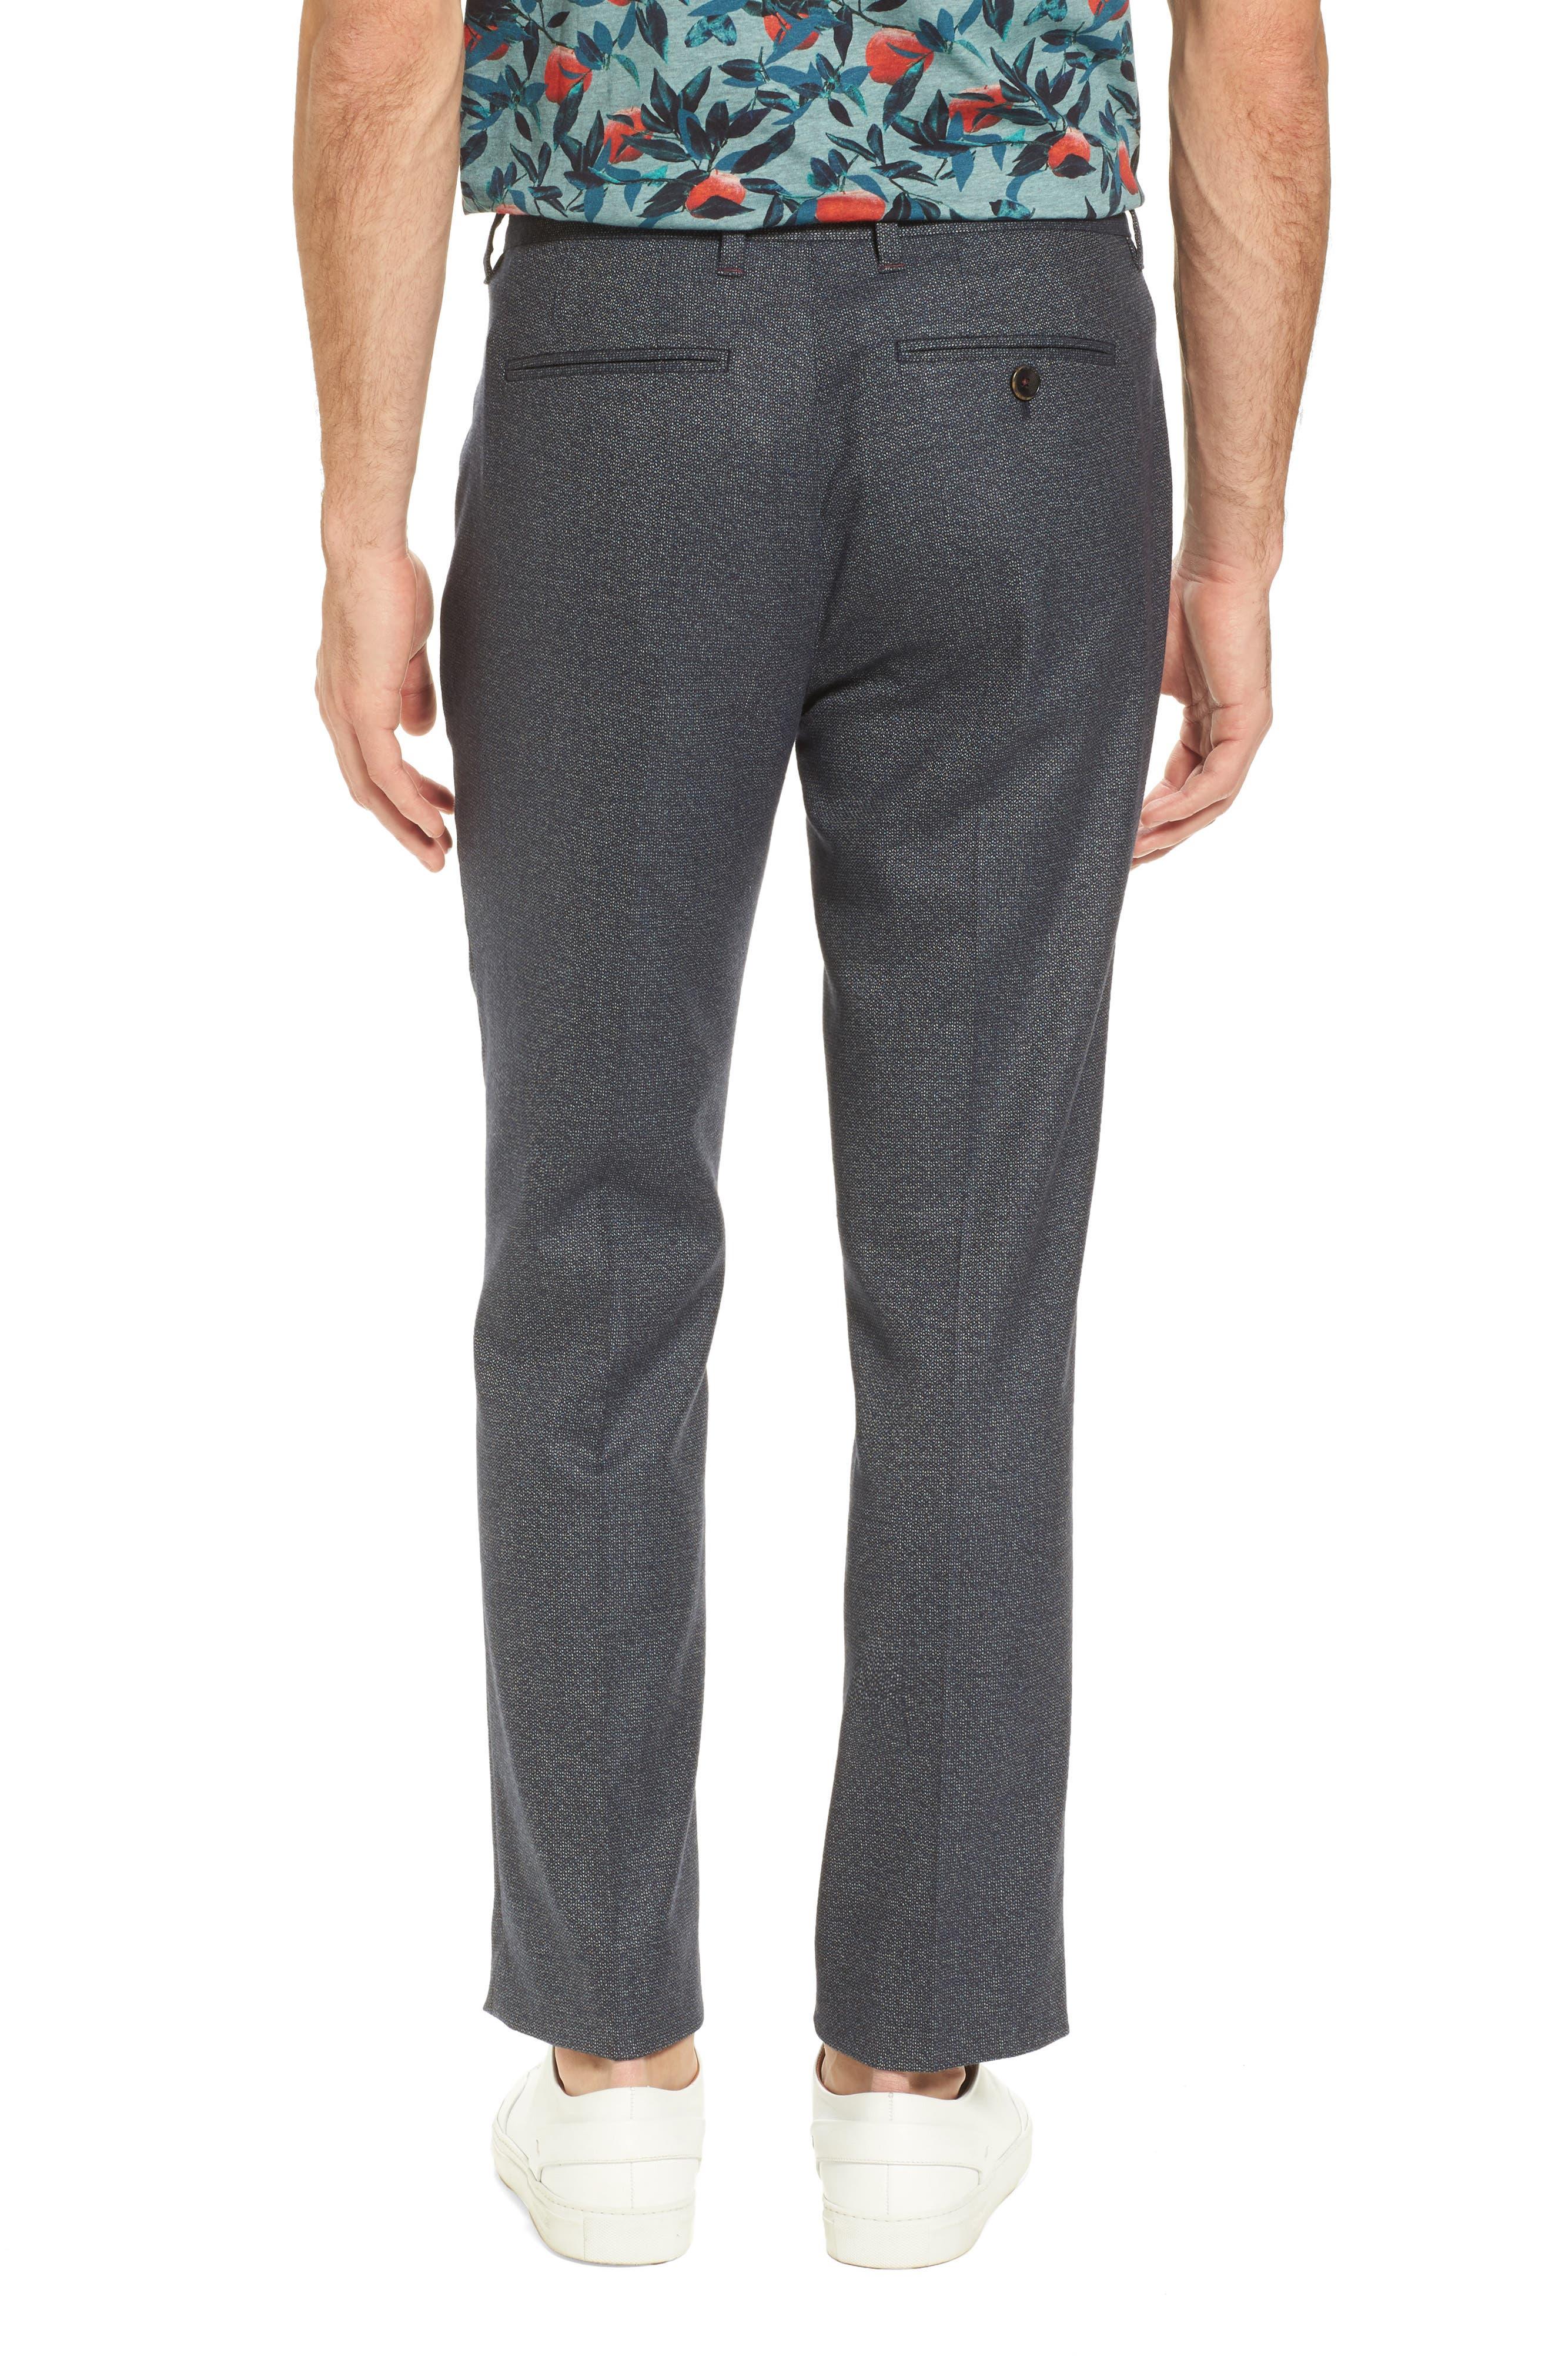 Beektro Trim Fit Trousers,                             Alternate thumbnail 2, color,